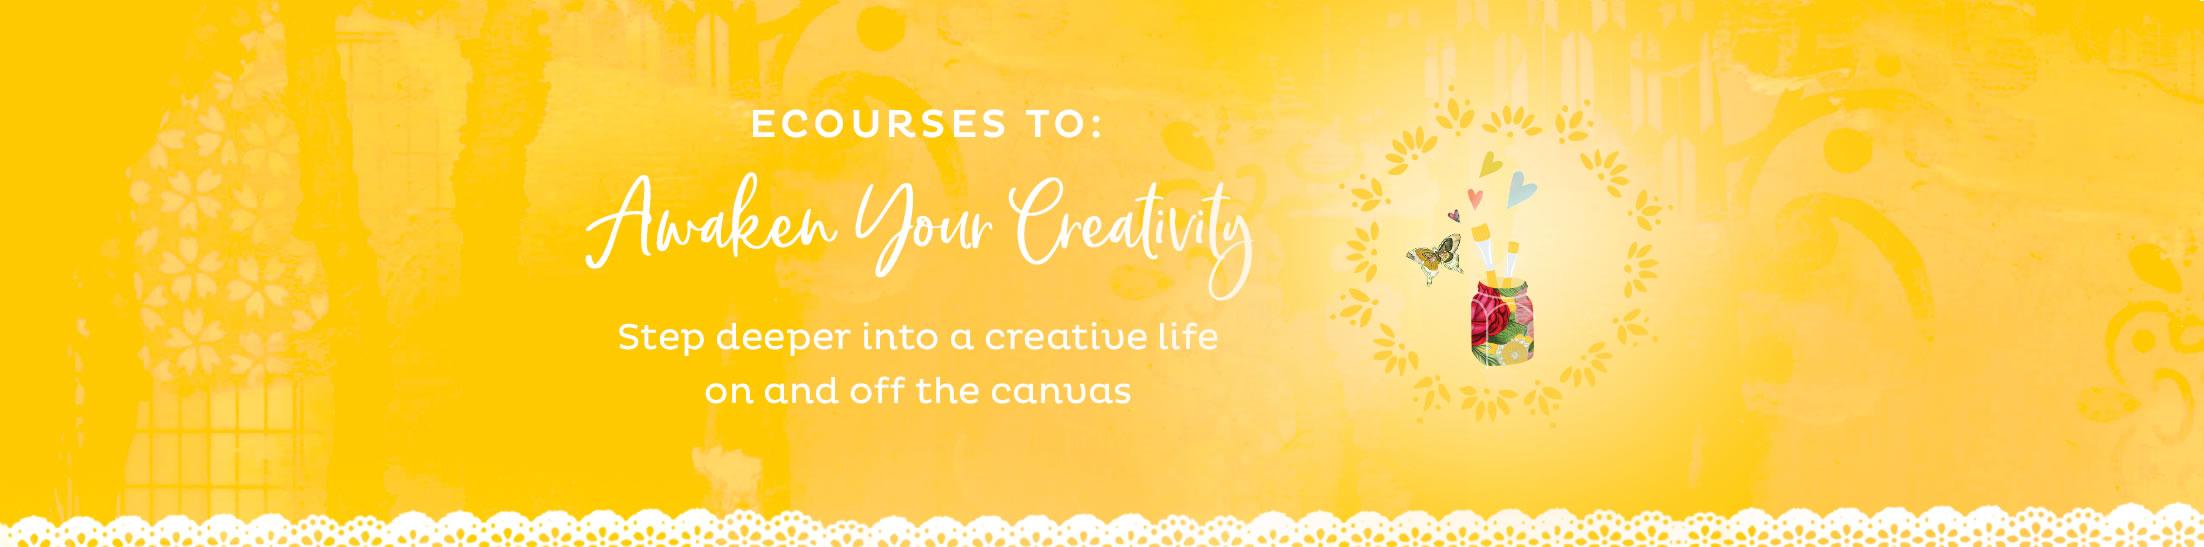 eCourses to Awaken Your Creativity